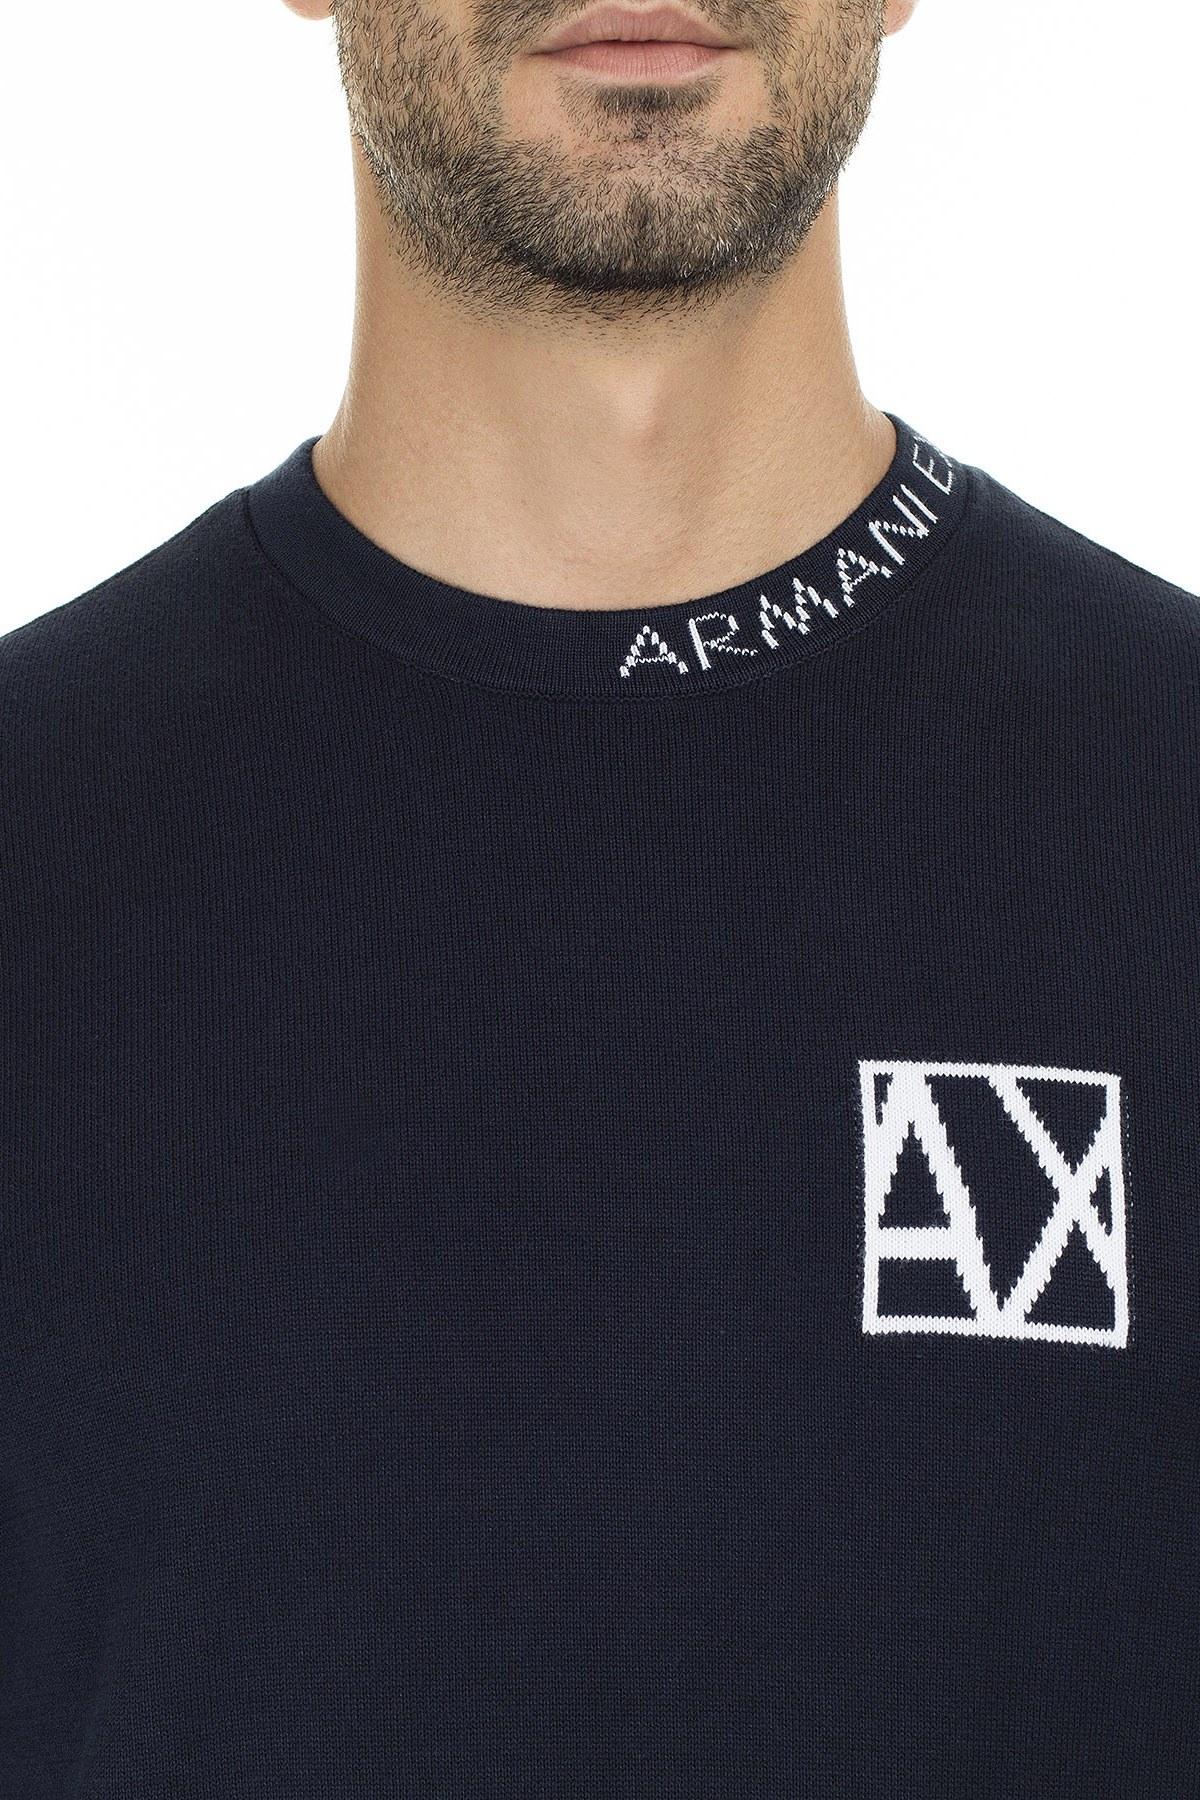 Armani Exchange Marka Logolu % 100 Pamuk Sıfır Yaka Erkek Kazak 6GZM2P ZMP8Z 1510 LACİVERT